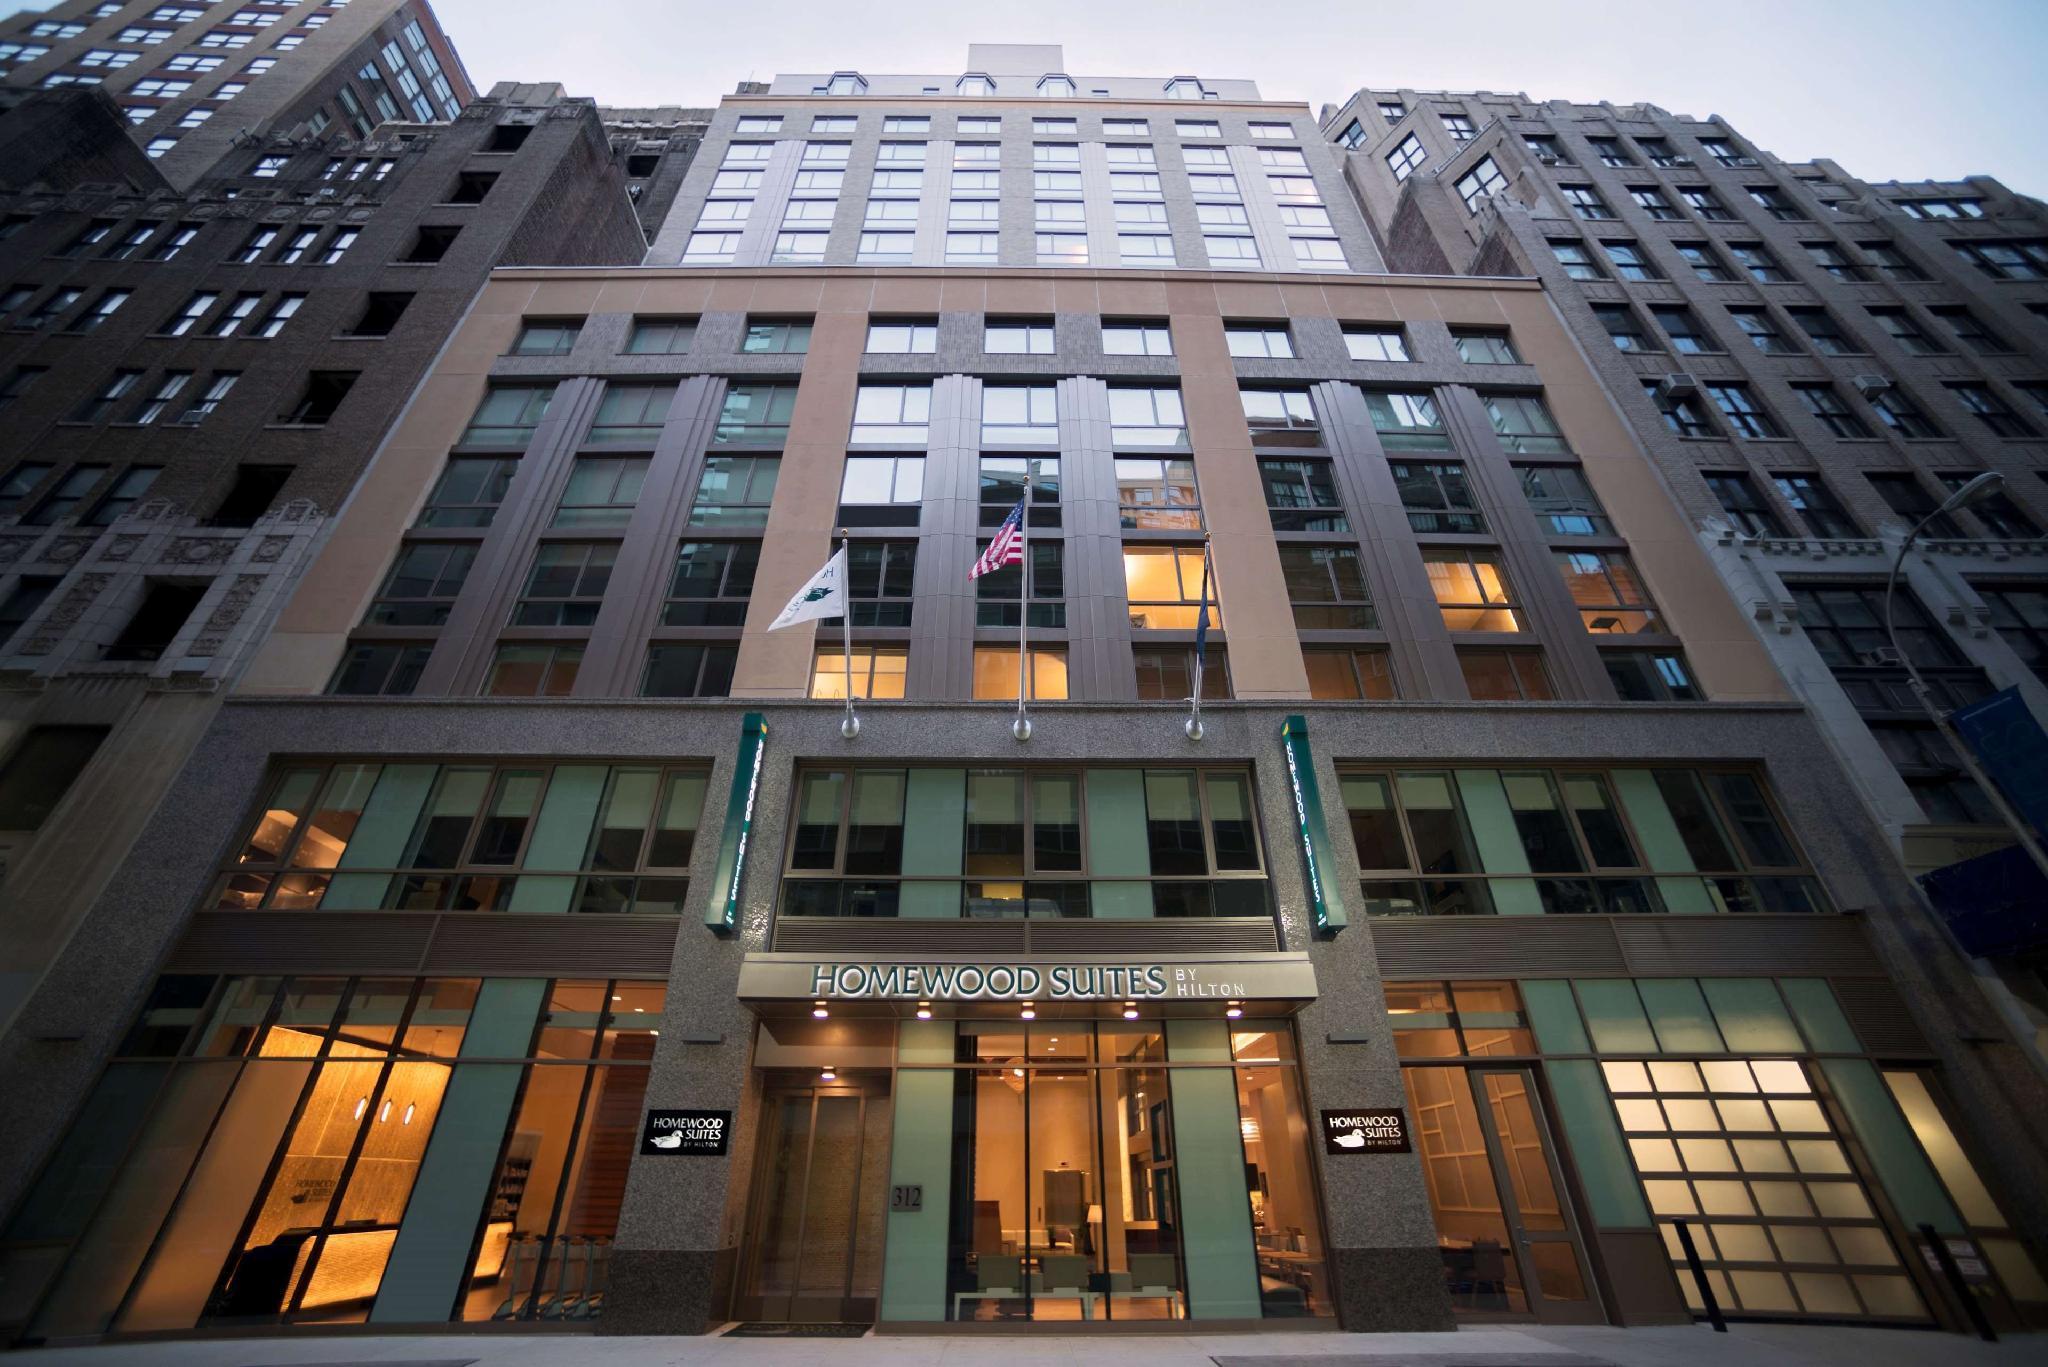 Homewood Suites New York Midtown Manhattan Times Sq South